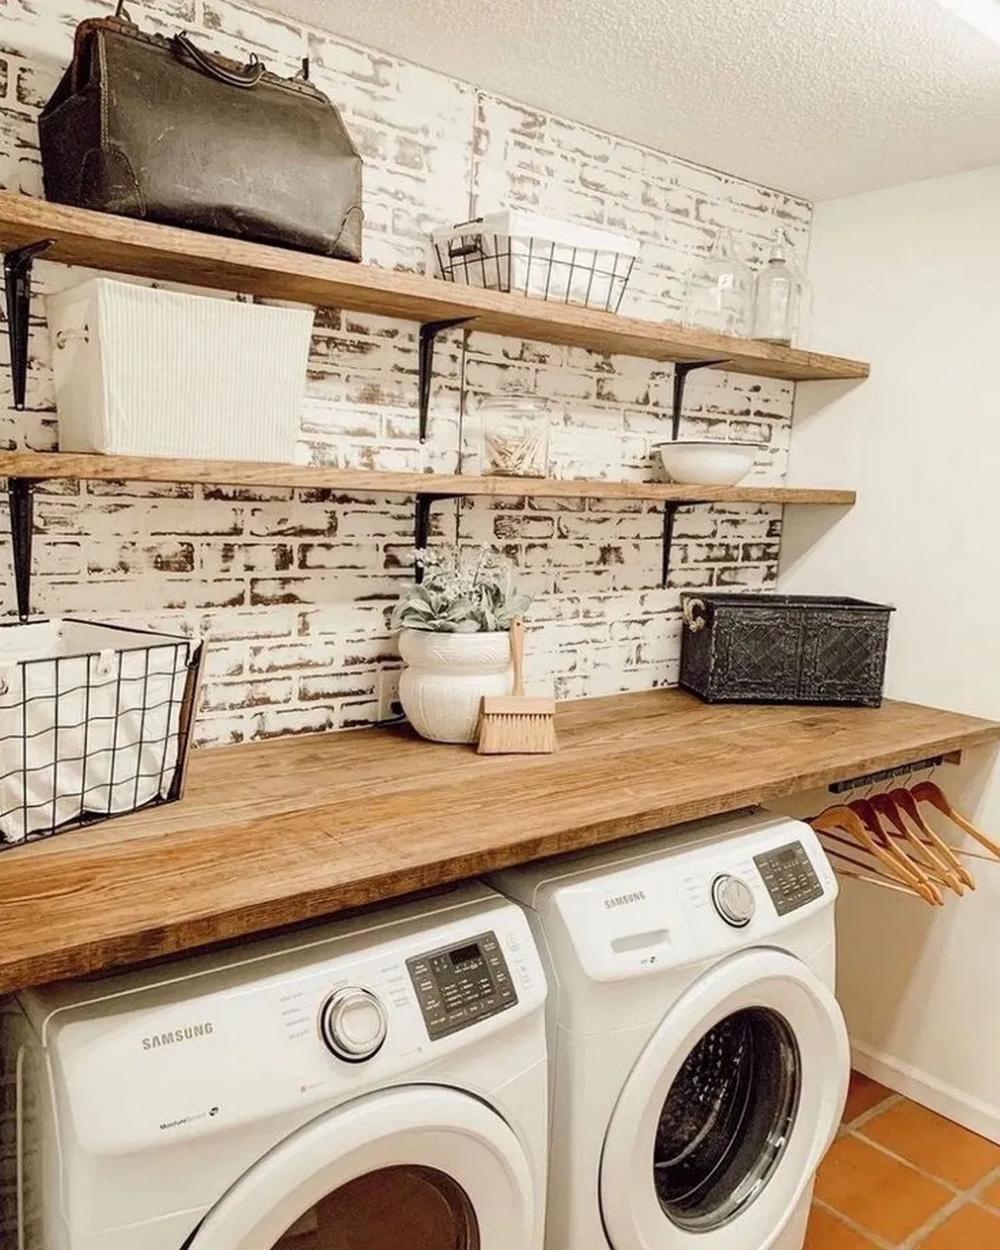 22 Dream Laundry Room Makeover Ideas 20 Inspiredesign